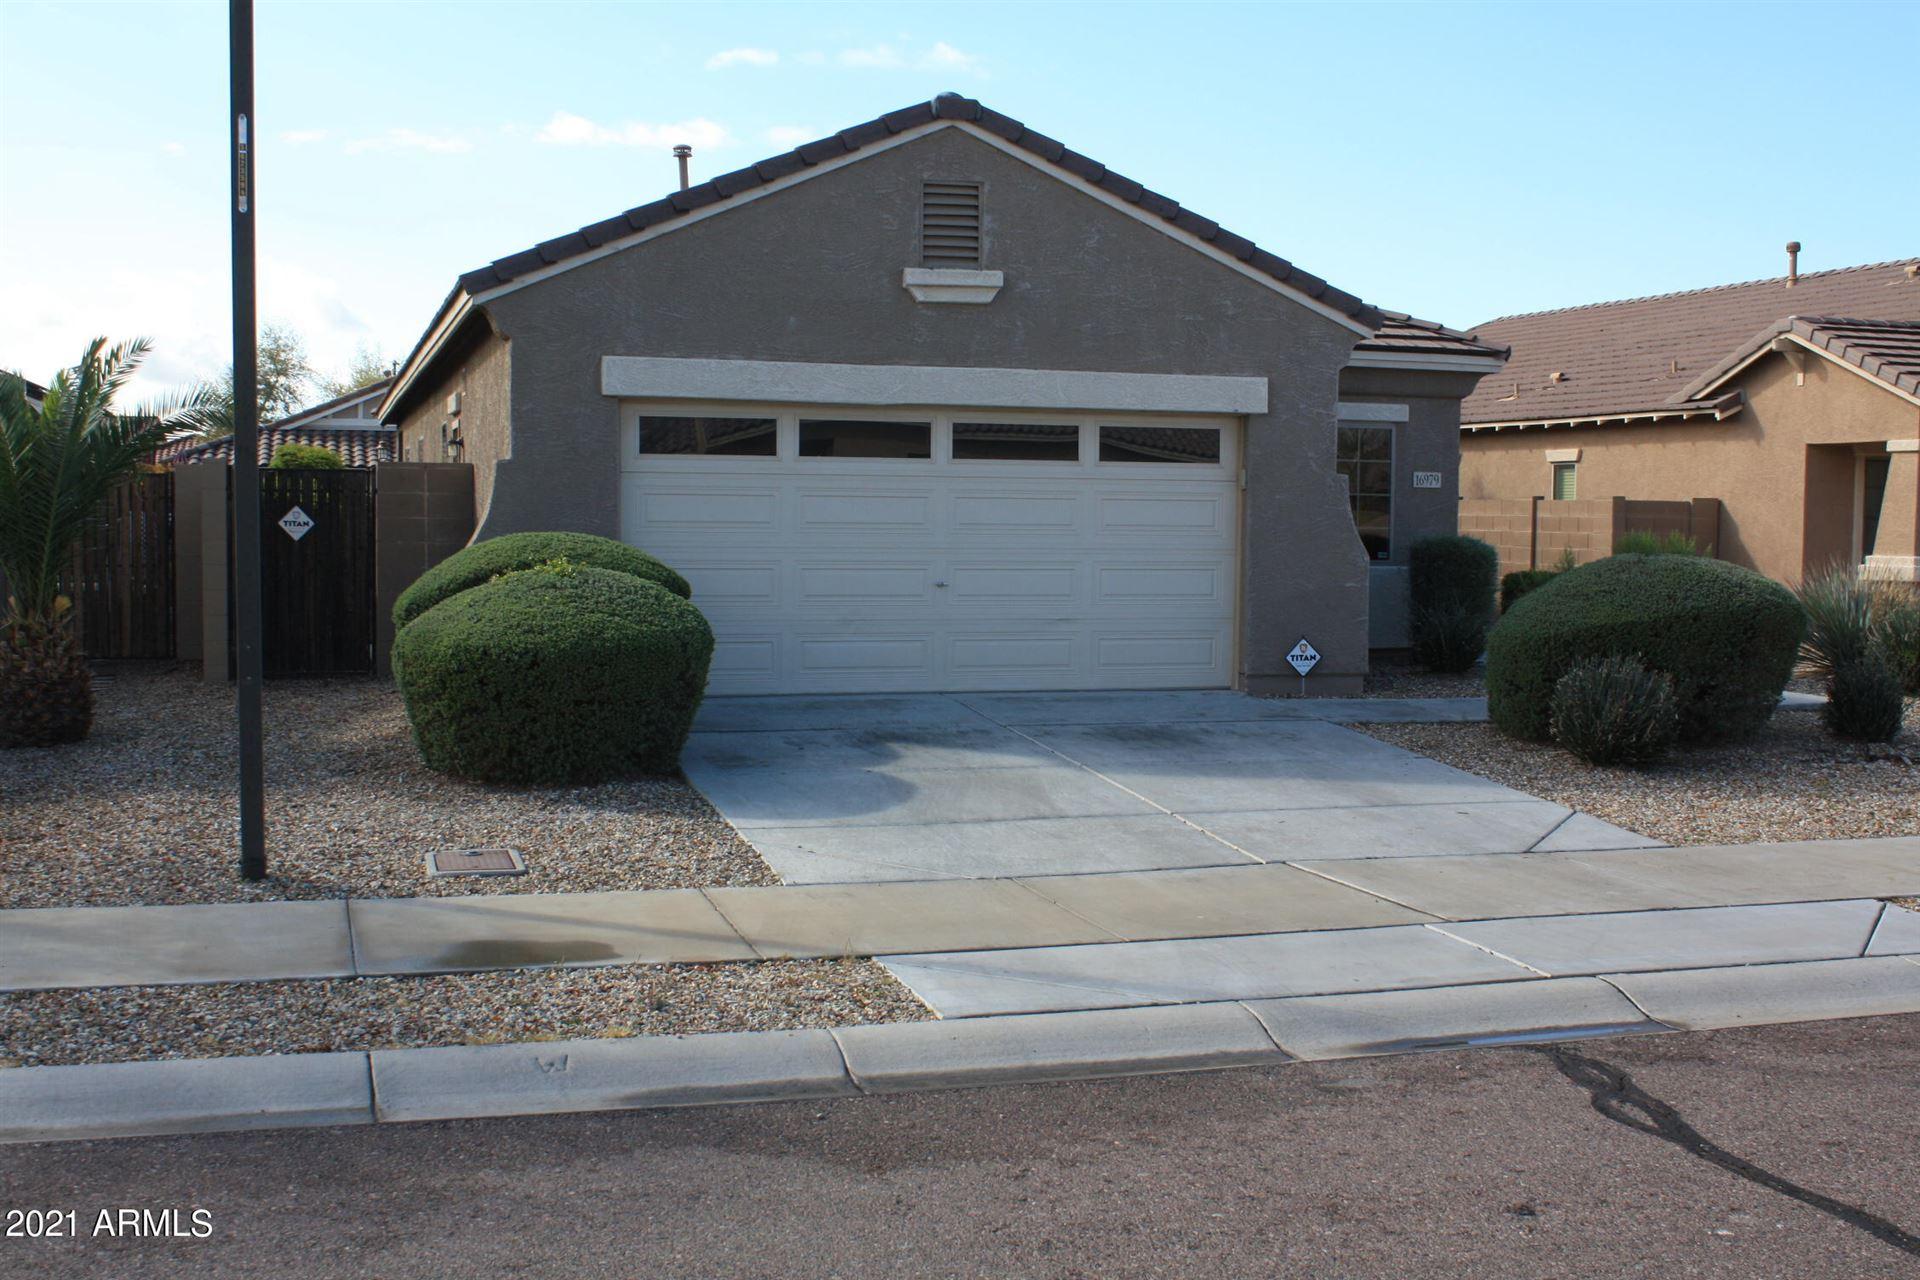 Photo of 16979 W SONORA Street, Goodyear, AZ 85338 (MLS # 6198627)